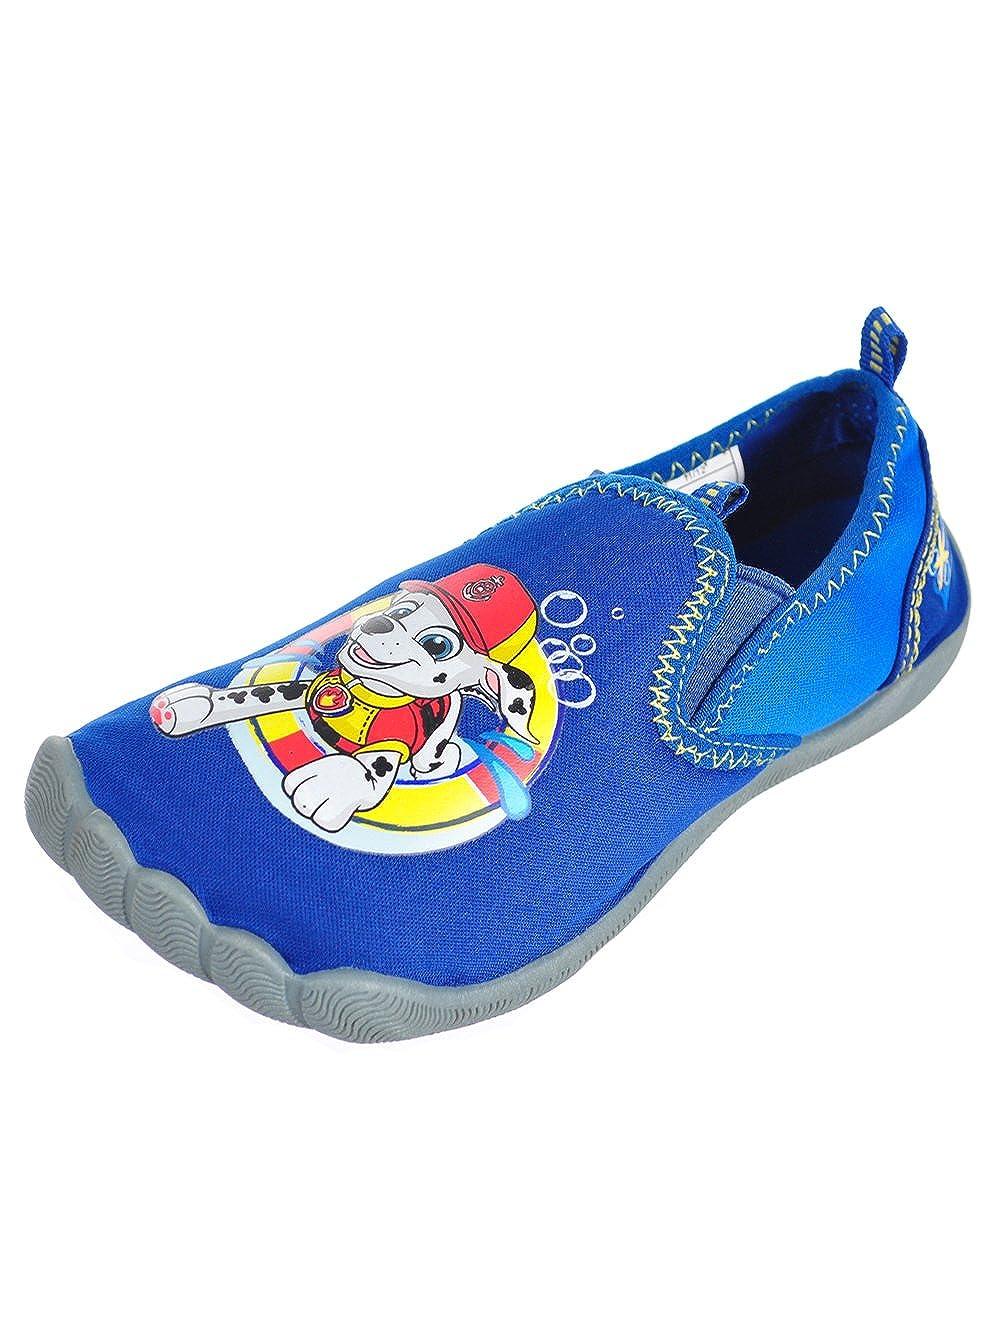 Josmo Kids Boys Paw Patrol Aqua Sock Low Top Slip On, Blue 1, Size 11-12 Kids